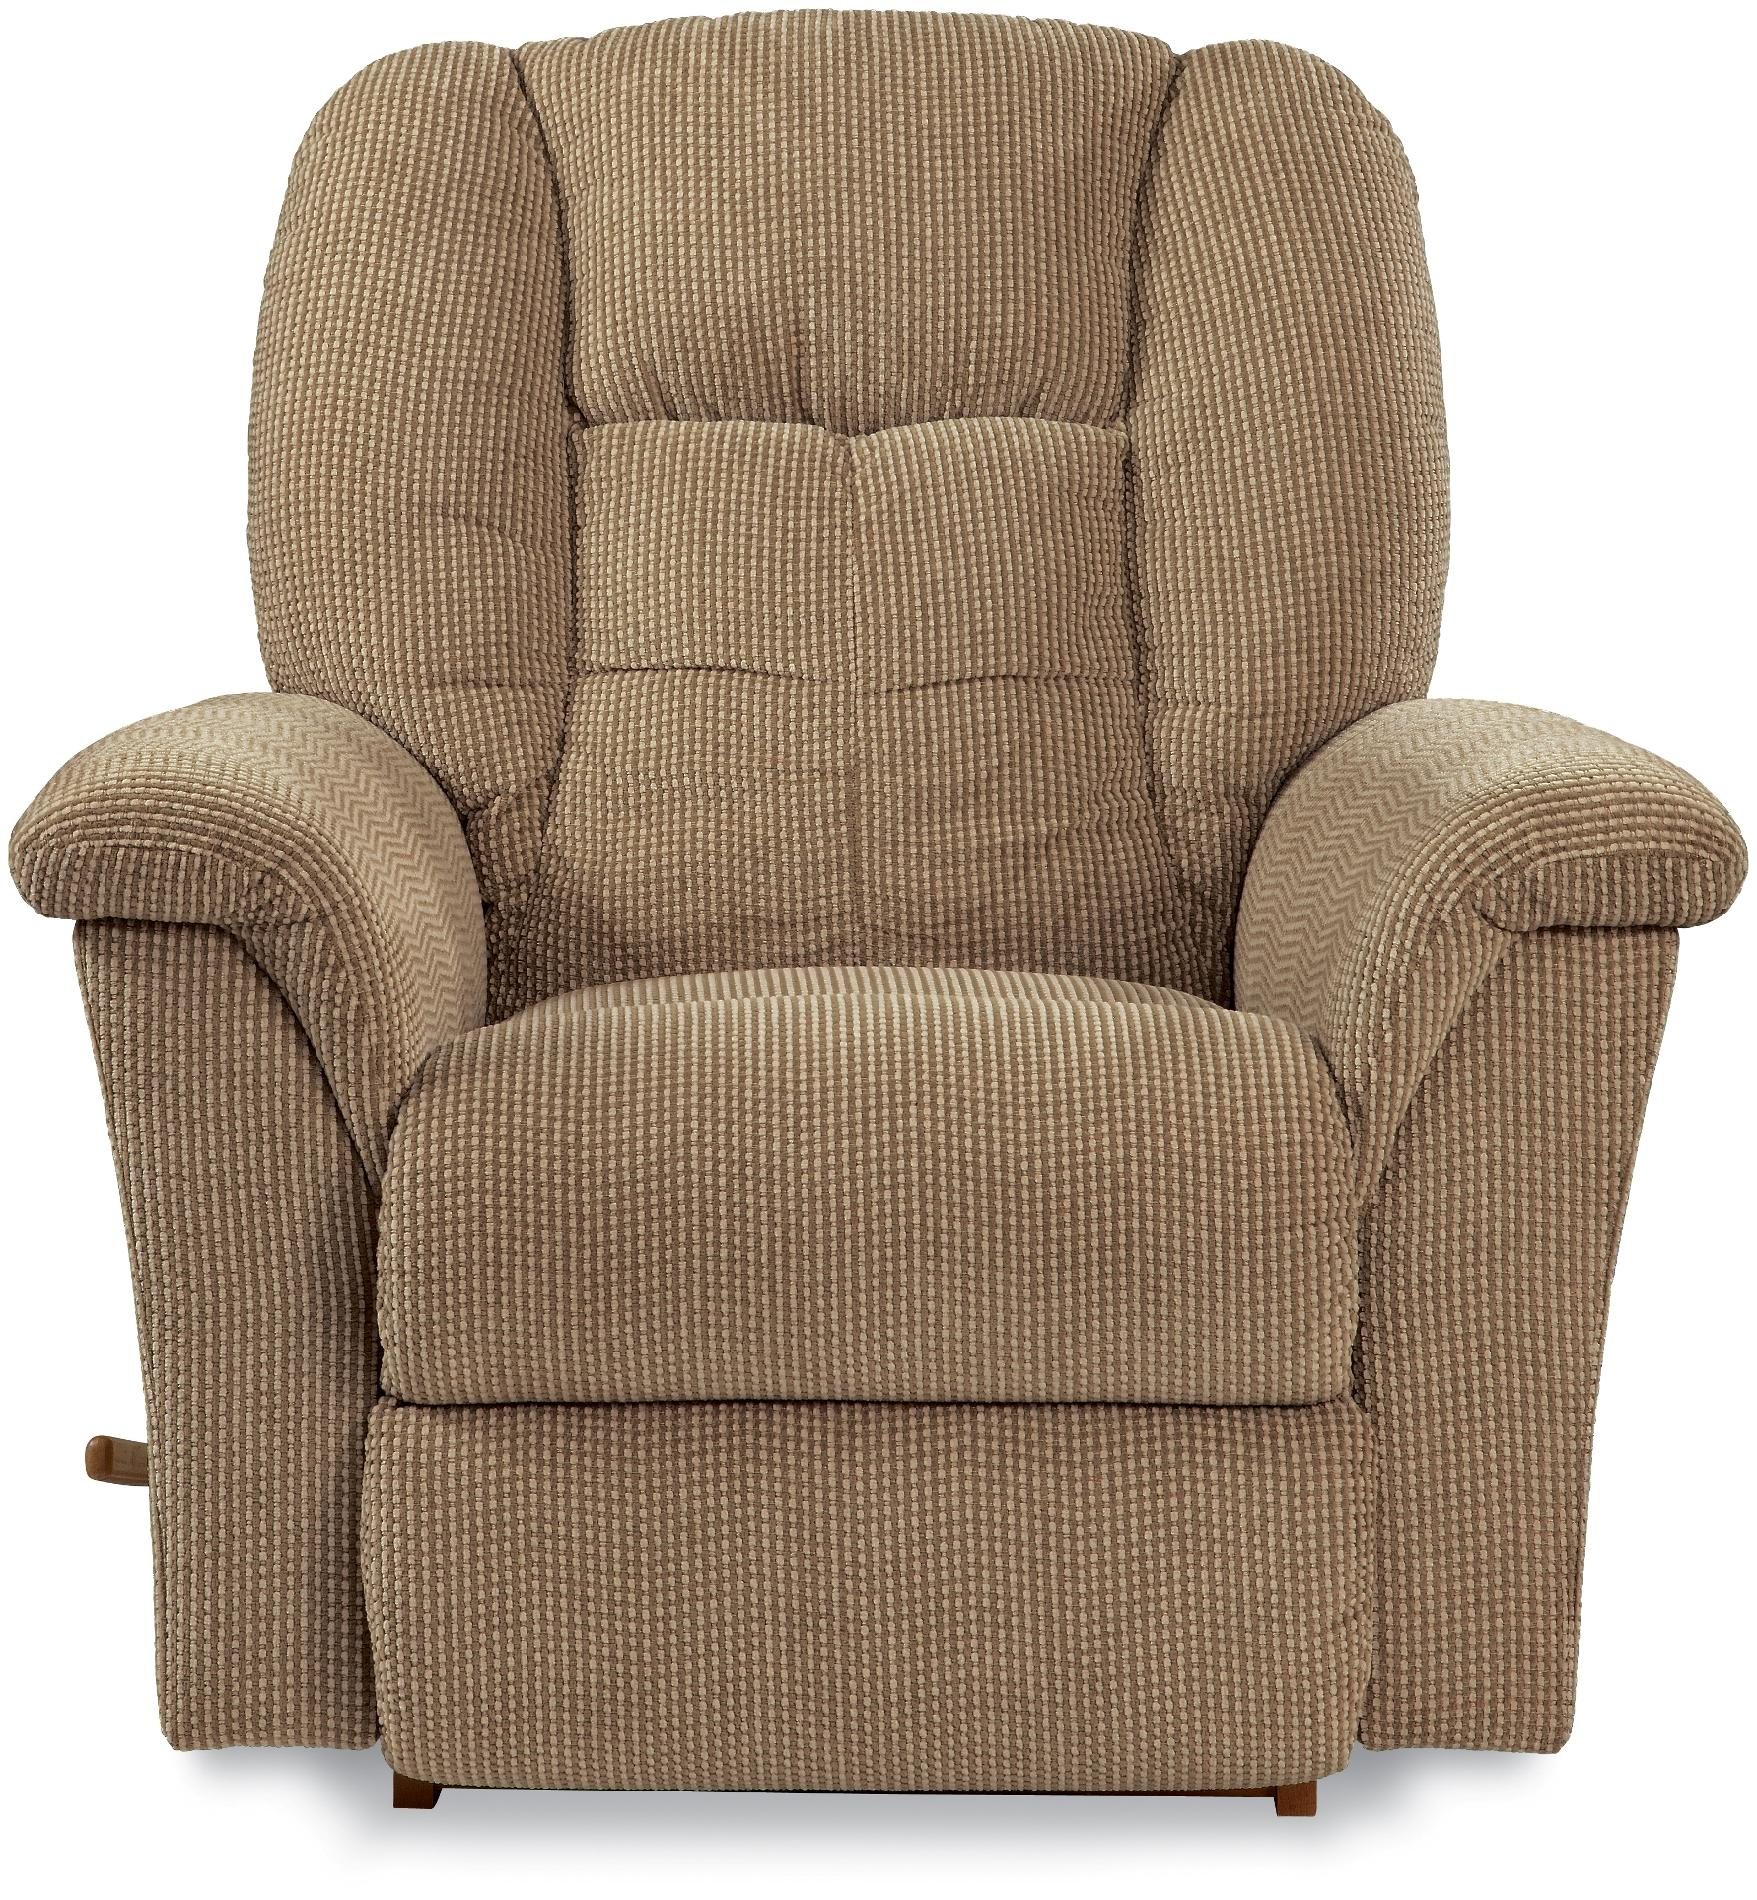 carter high chair replacement parts wheelchair icon la z boy recliner brown sugar